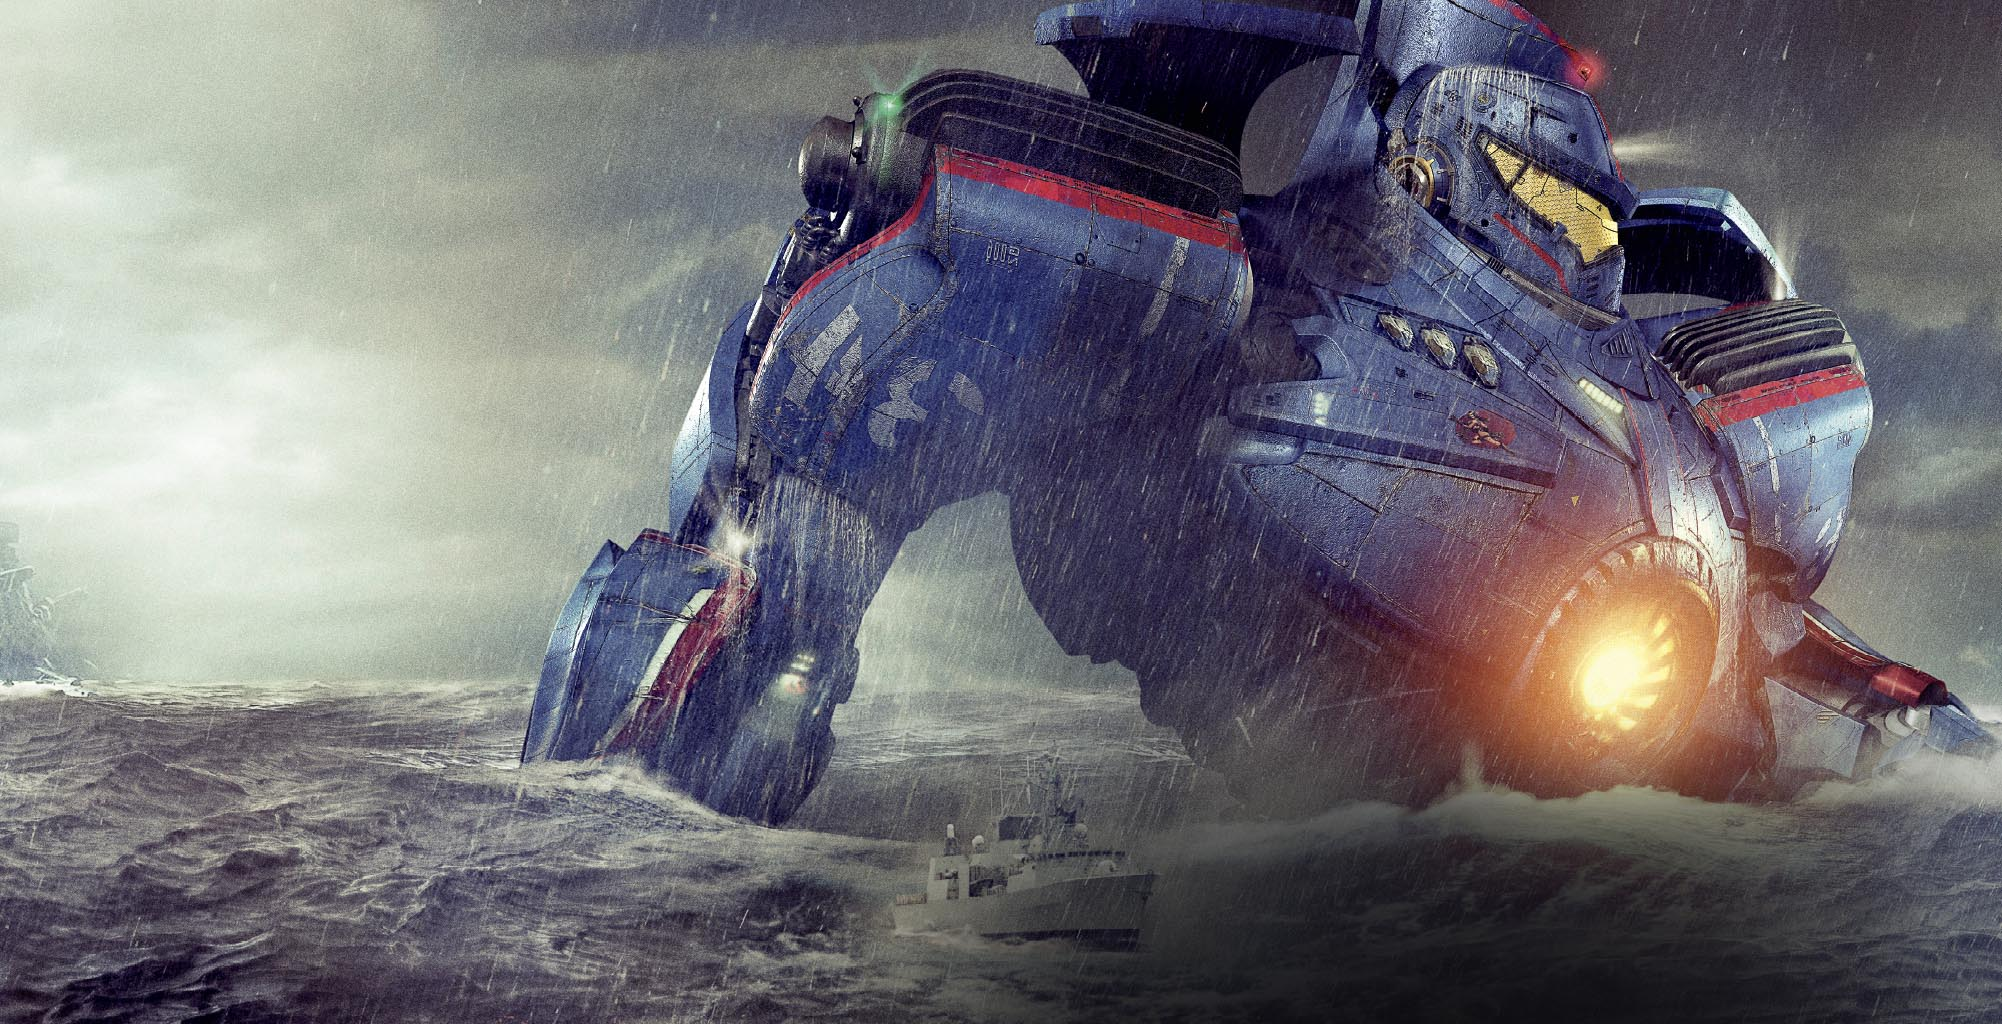 Star Wars' John Boyega shares new look at Pacific Rim: Uprising